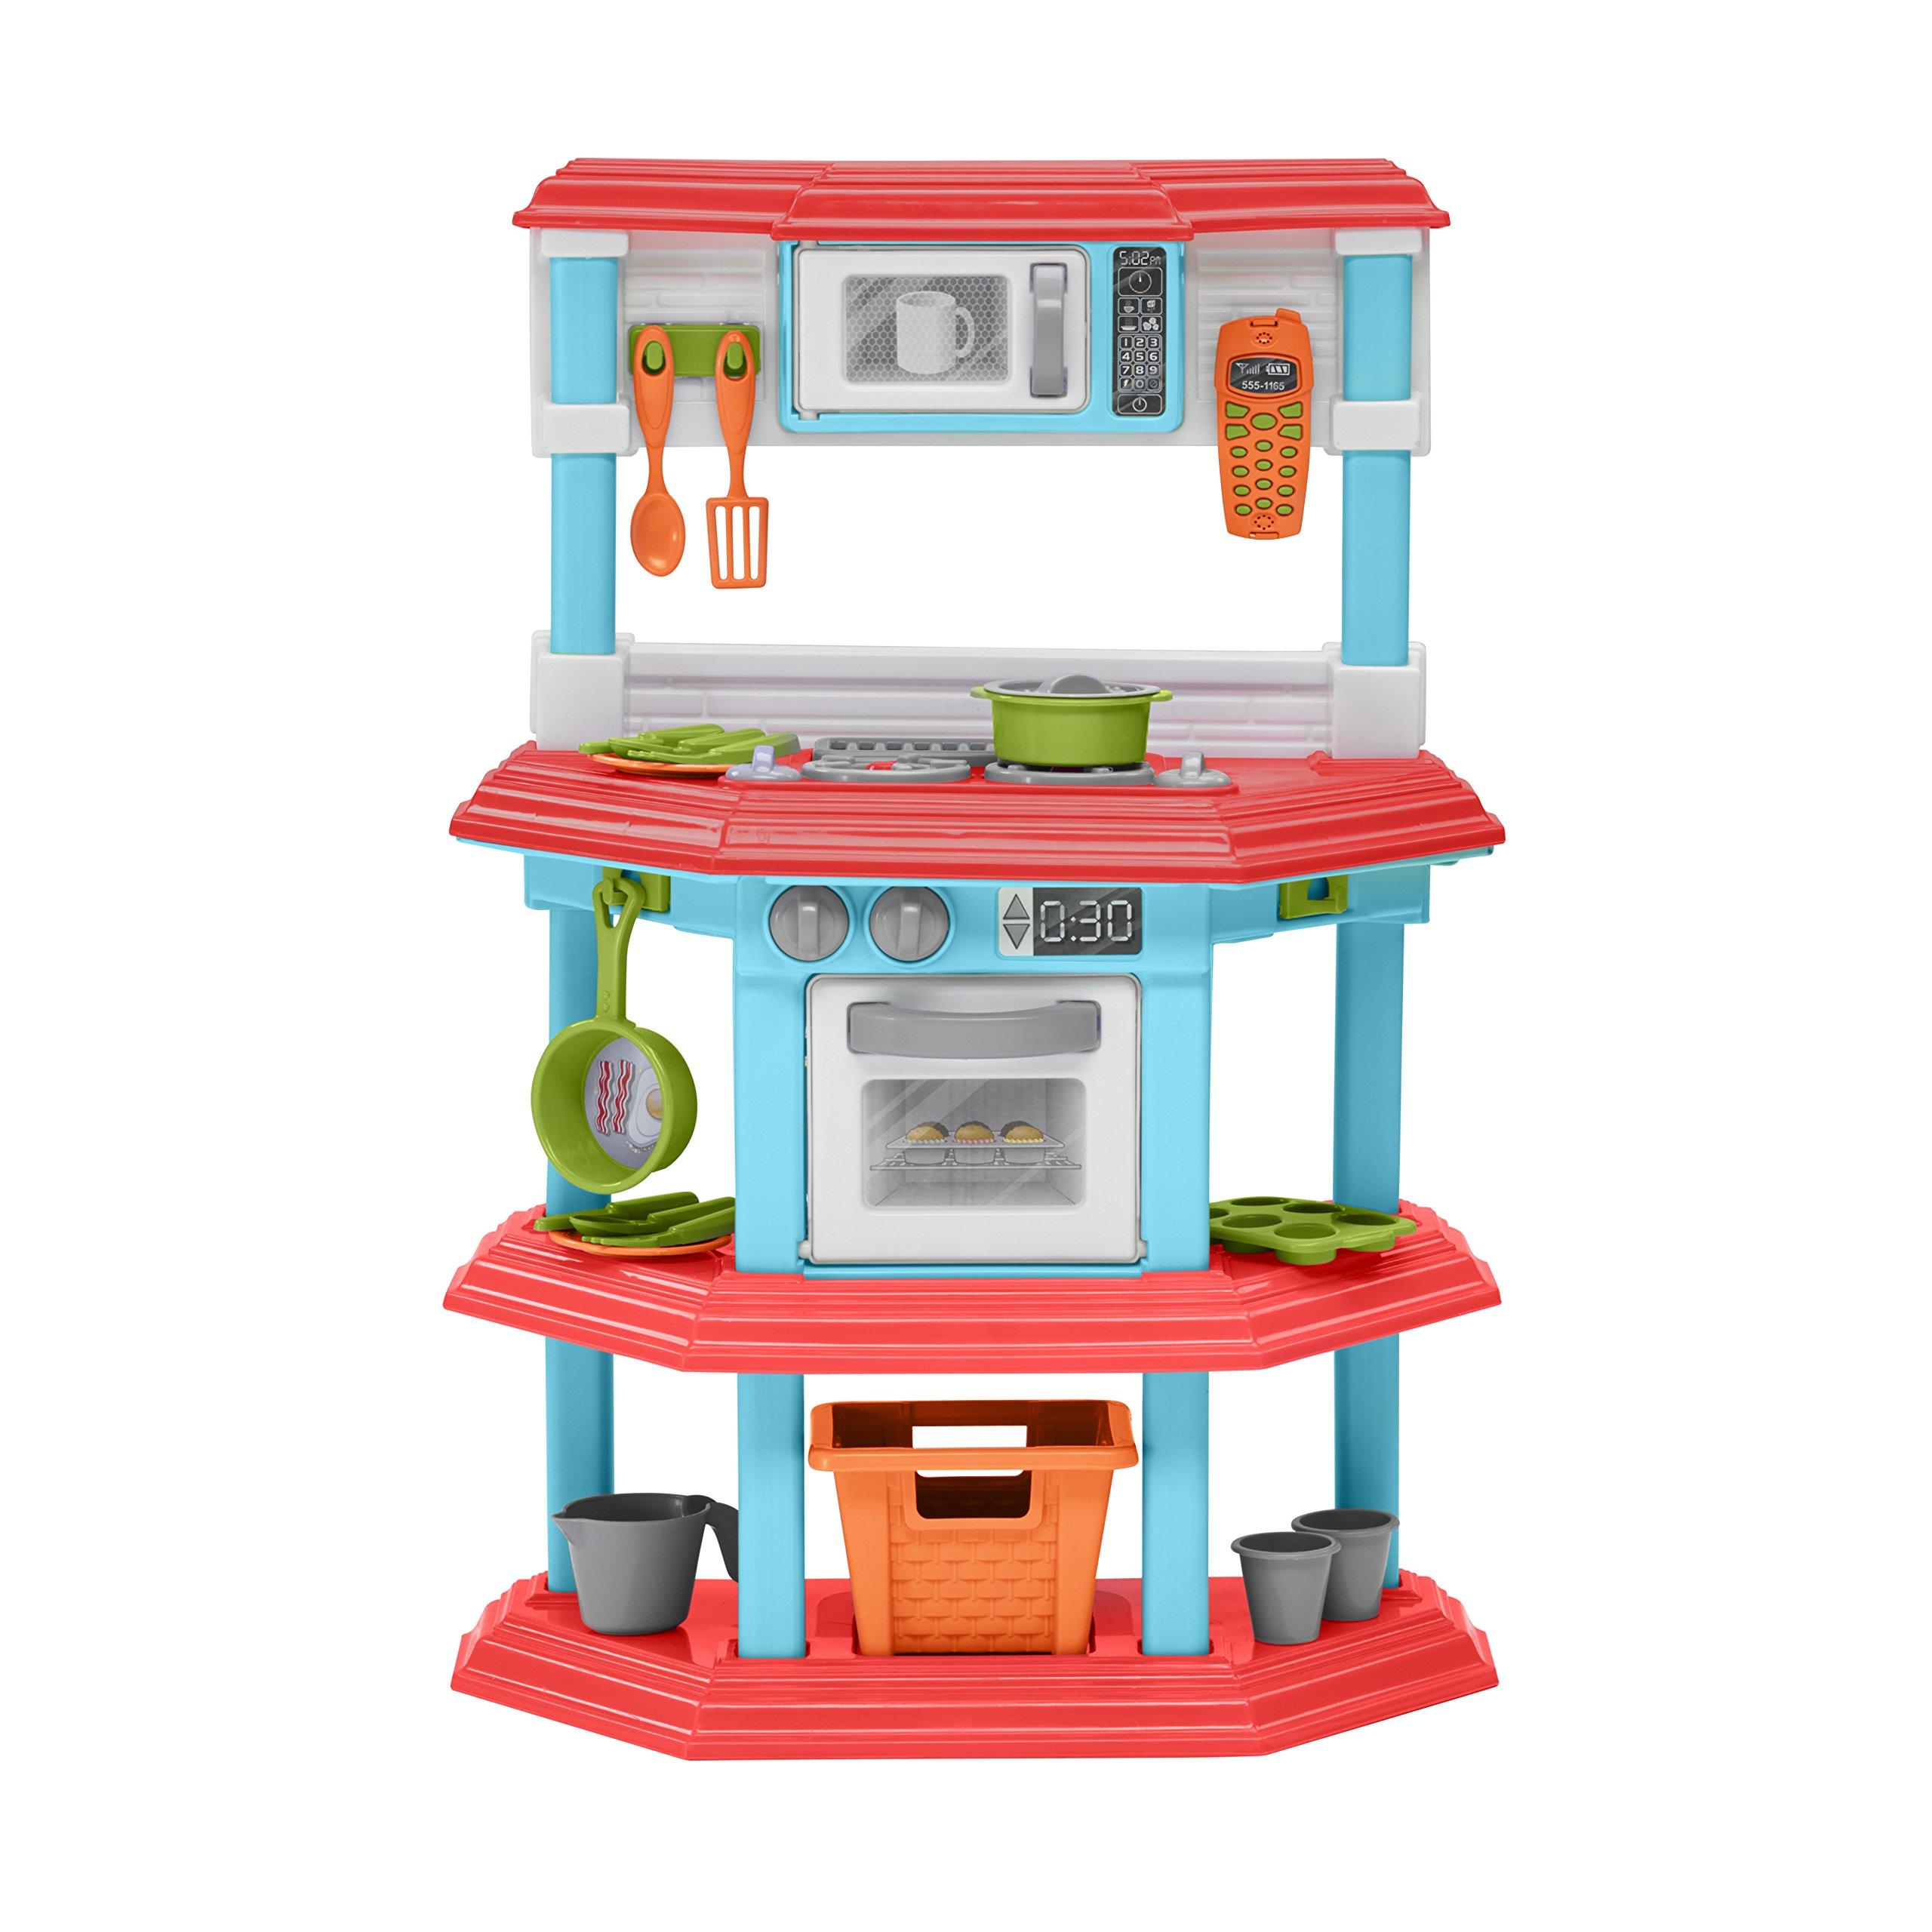 American Plastic Toys My Very Own Gourmet Kitchen by American Plastic Toys